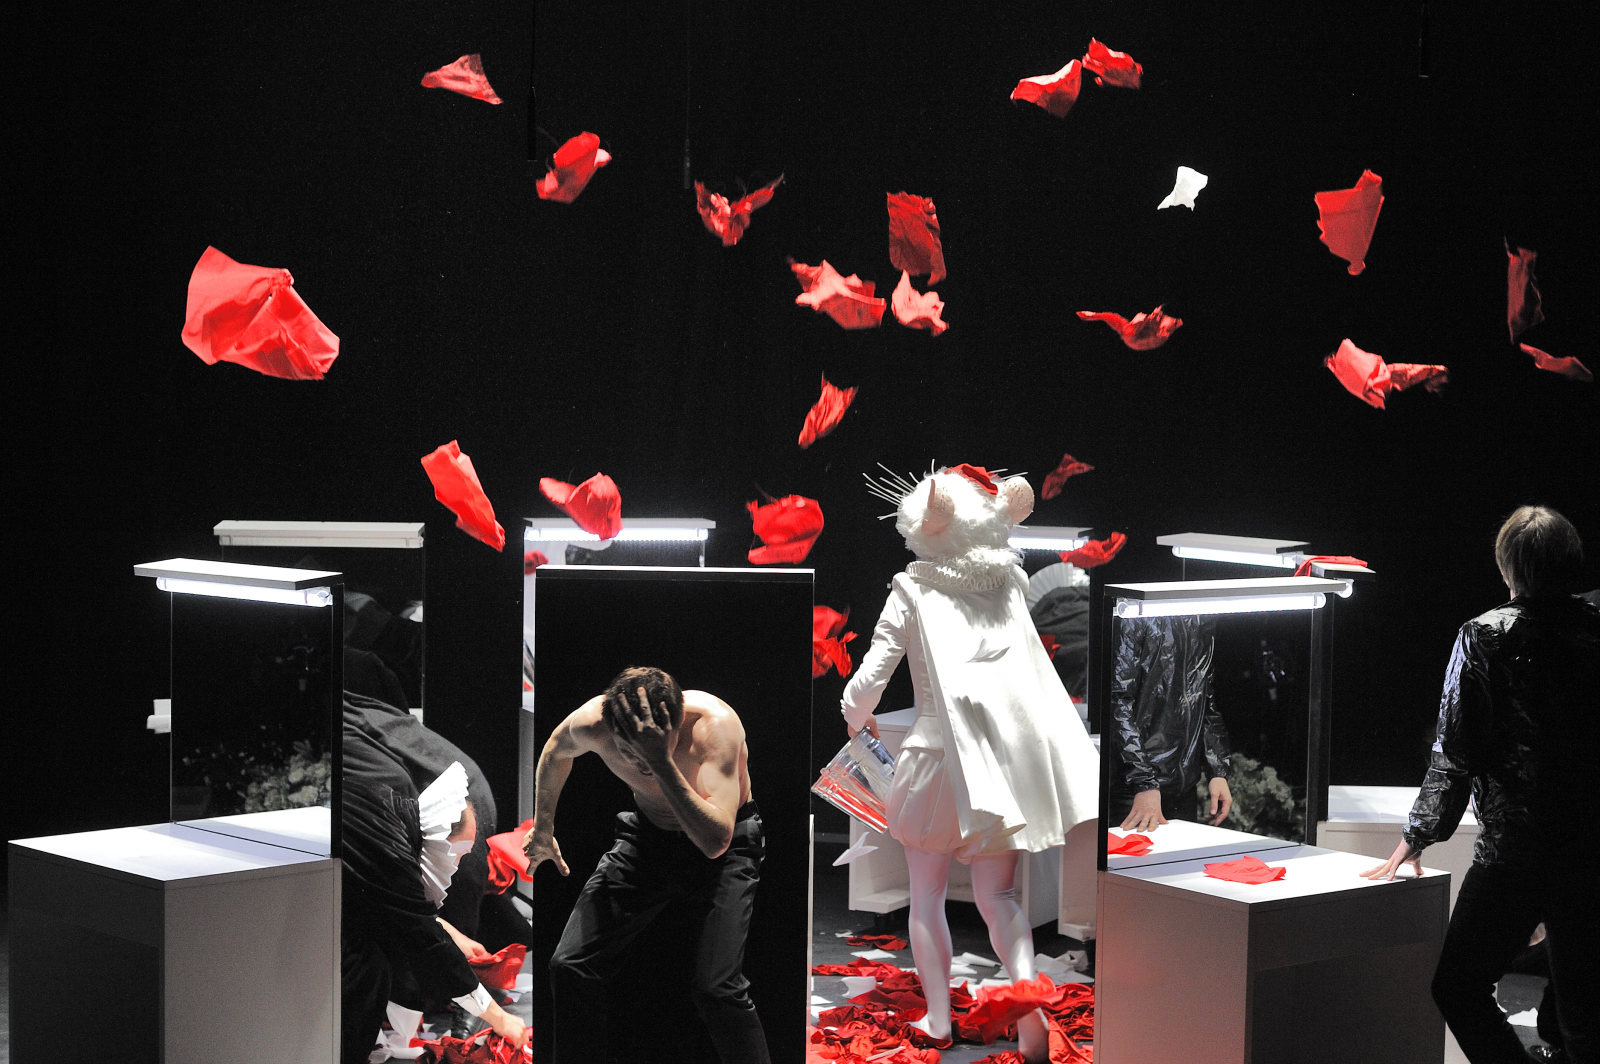 Festival Atene-Epidauro 2016  # 3 – Shakespeare e Marlowe alla greca